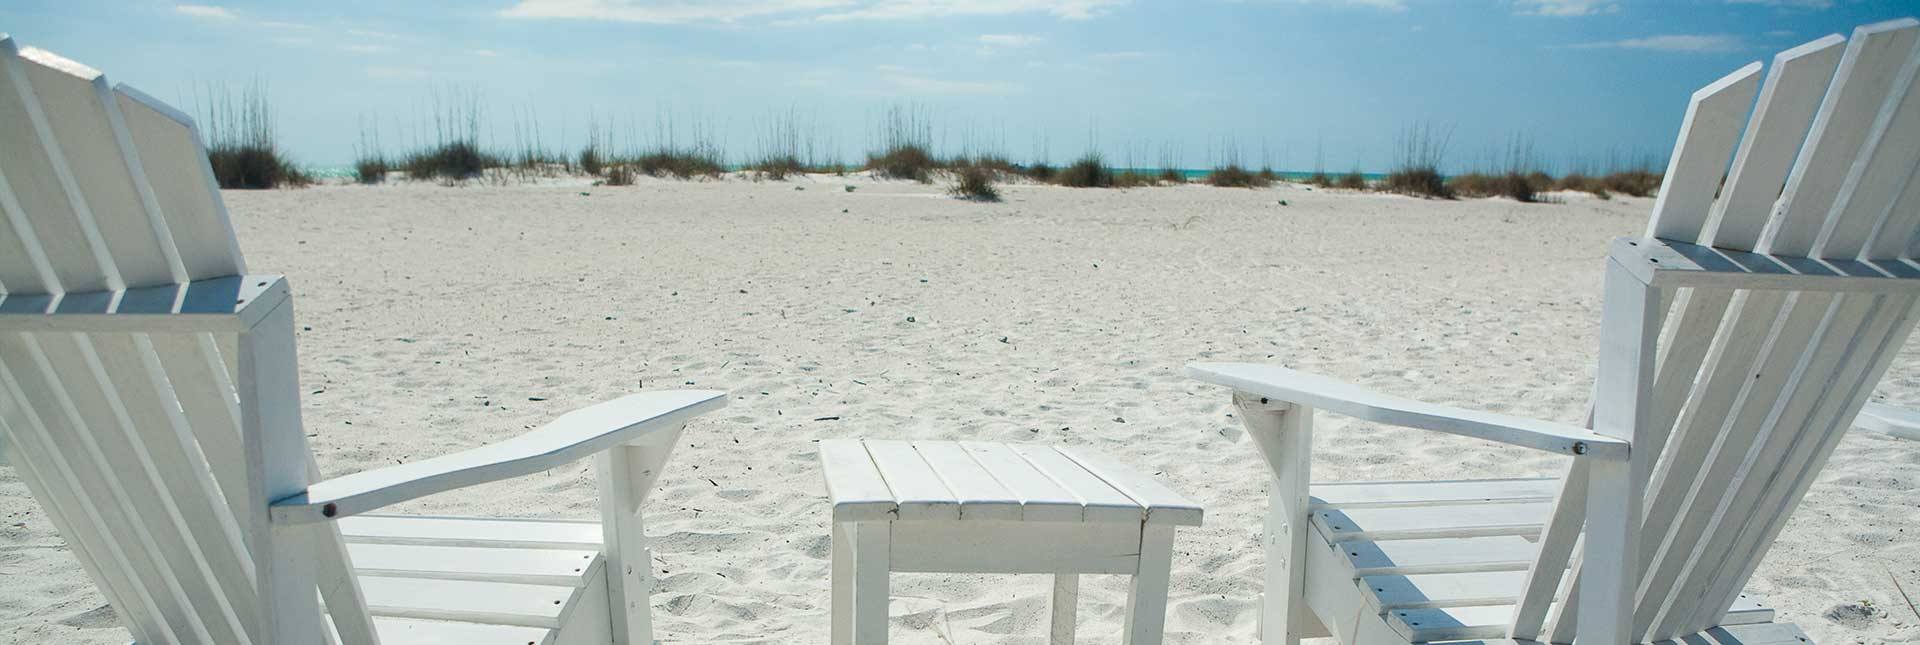 Paradise Realty Real Estate Amp Vacation Rentals Anna